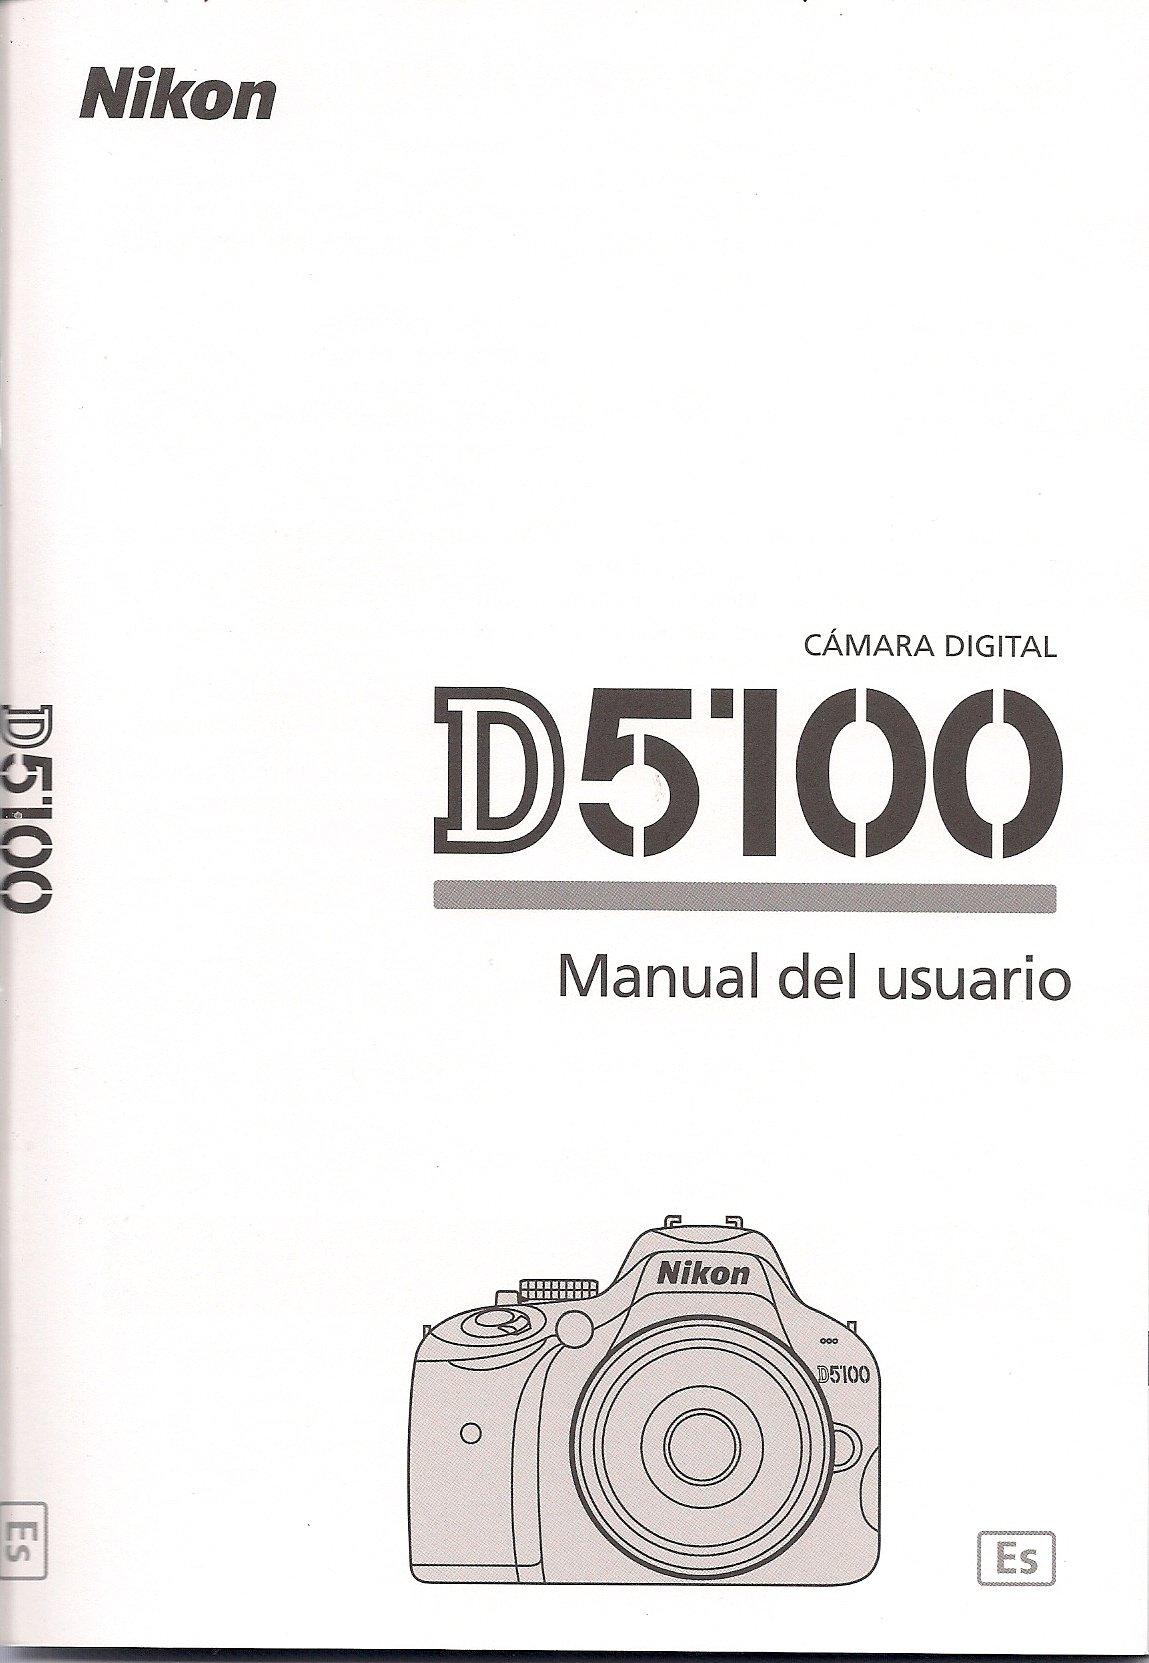 Nikon D5100 Manual del usuario Spanish Instructions Español Paperback – 2011